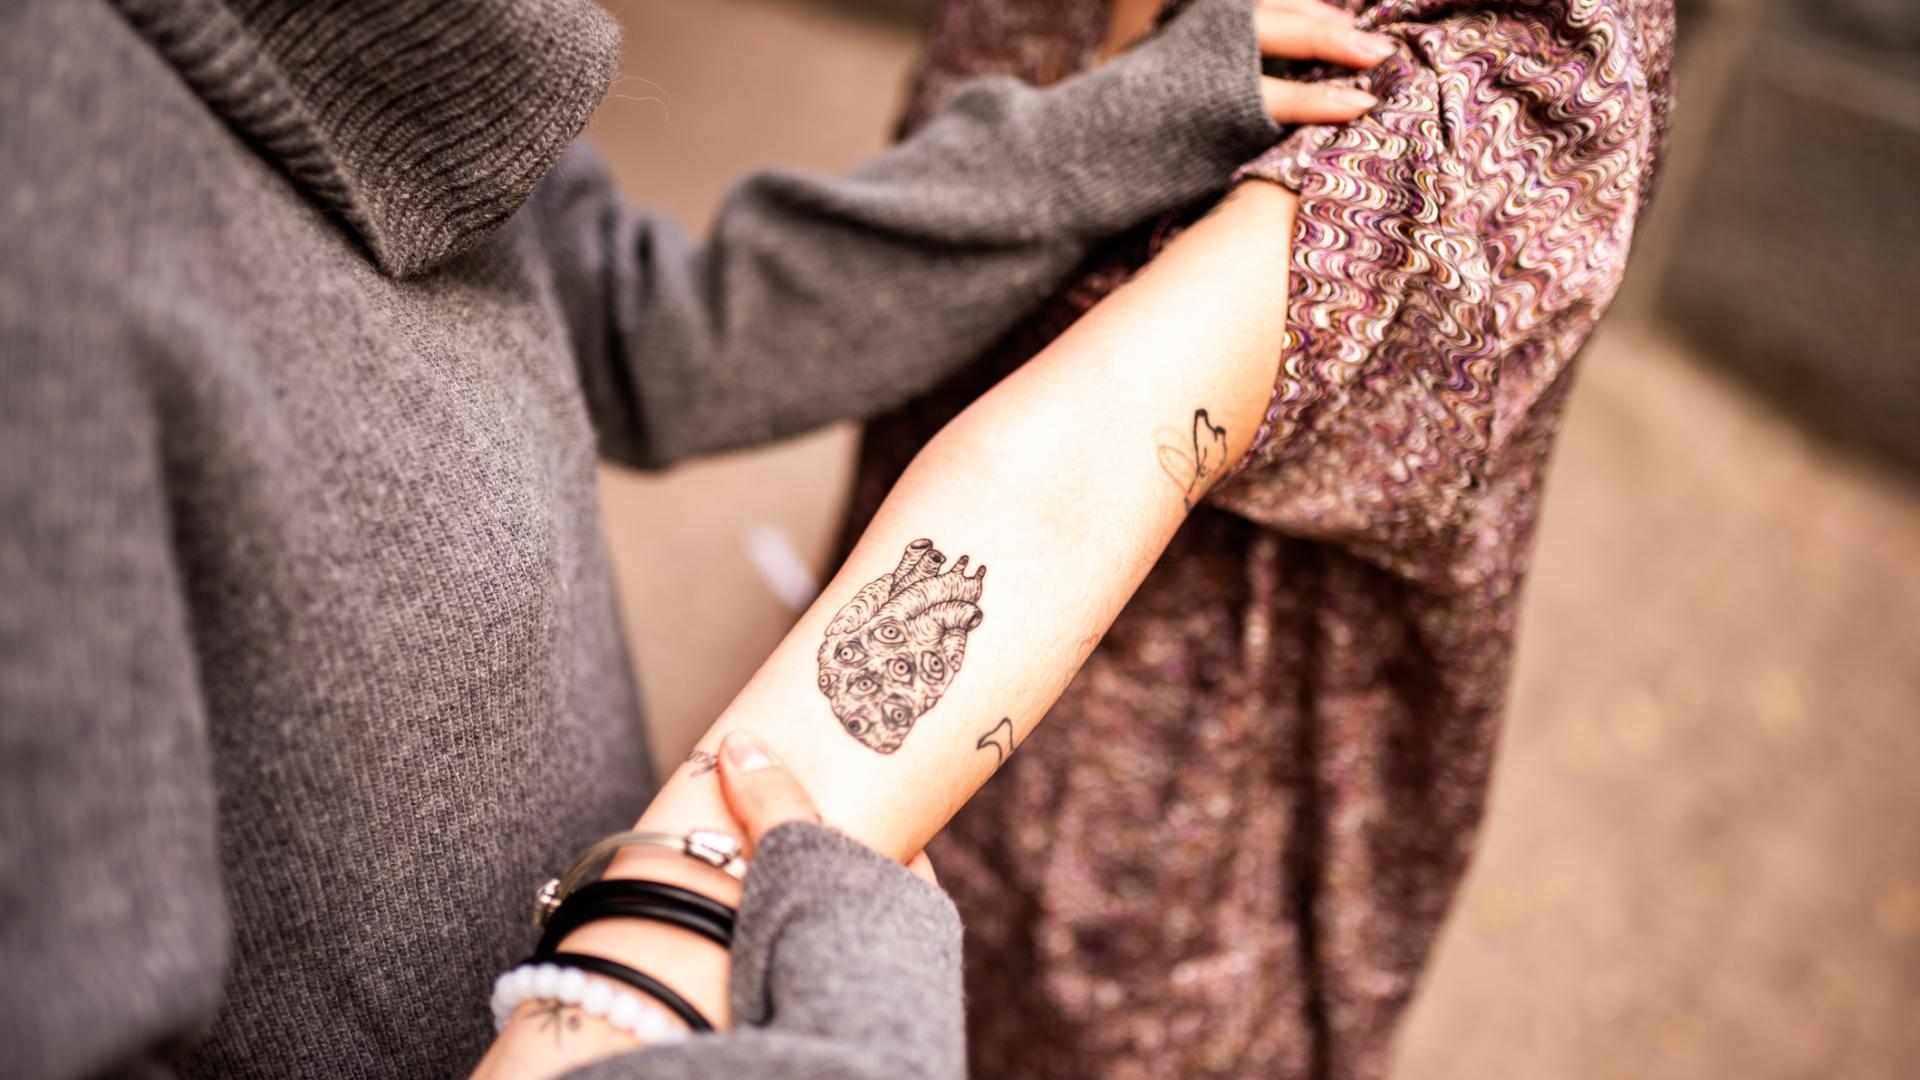 Tatto Herz